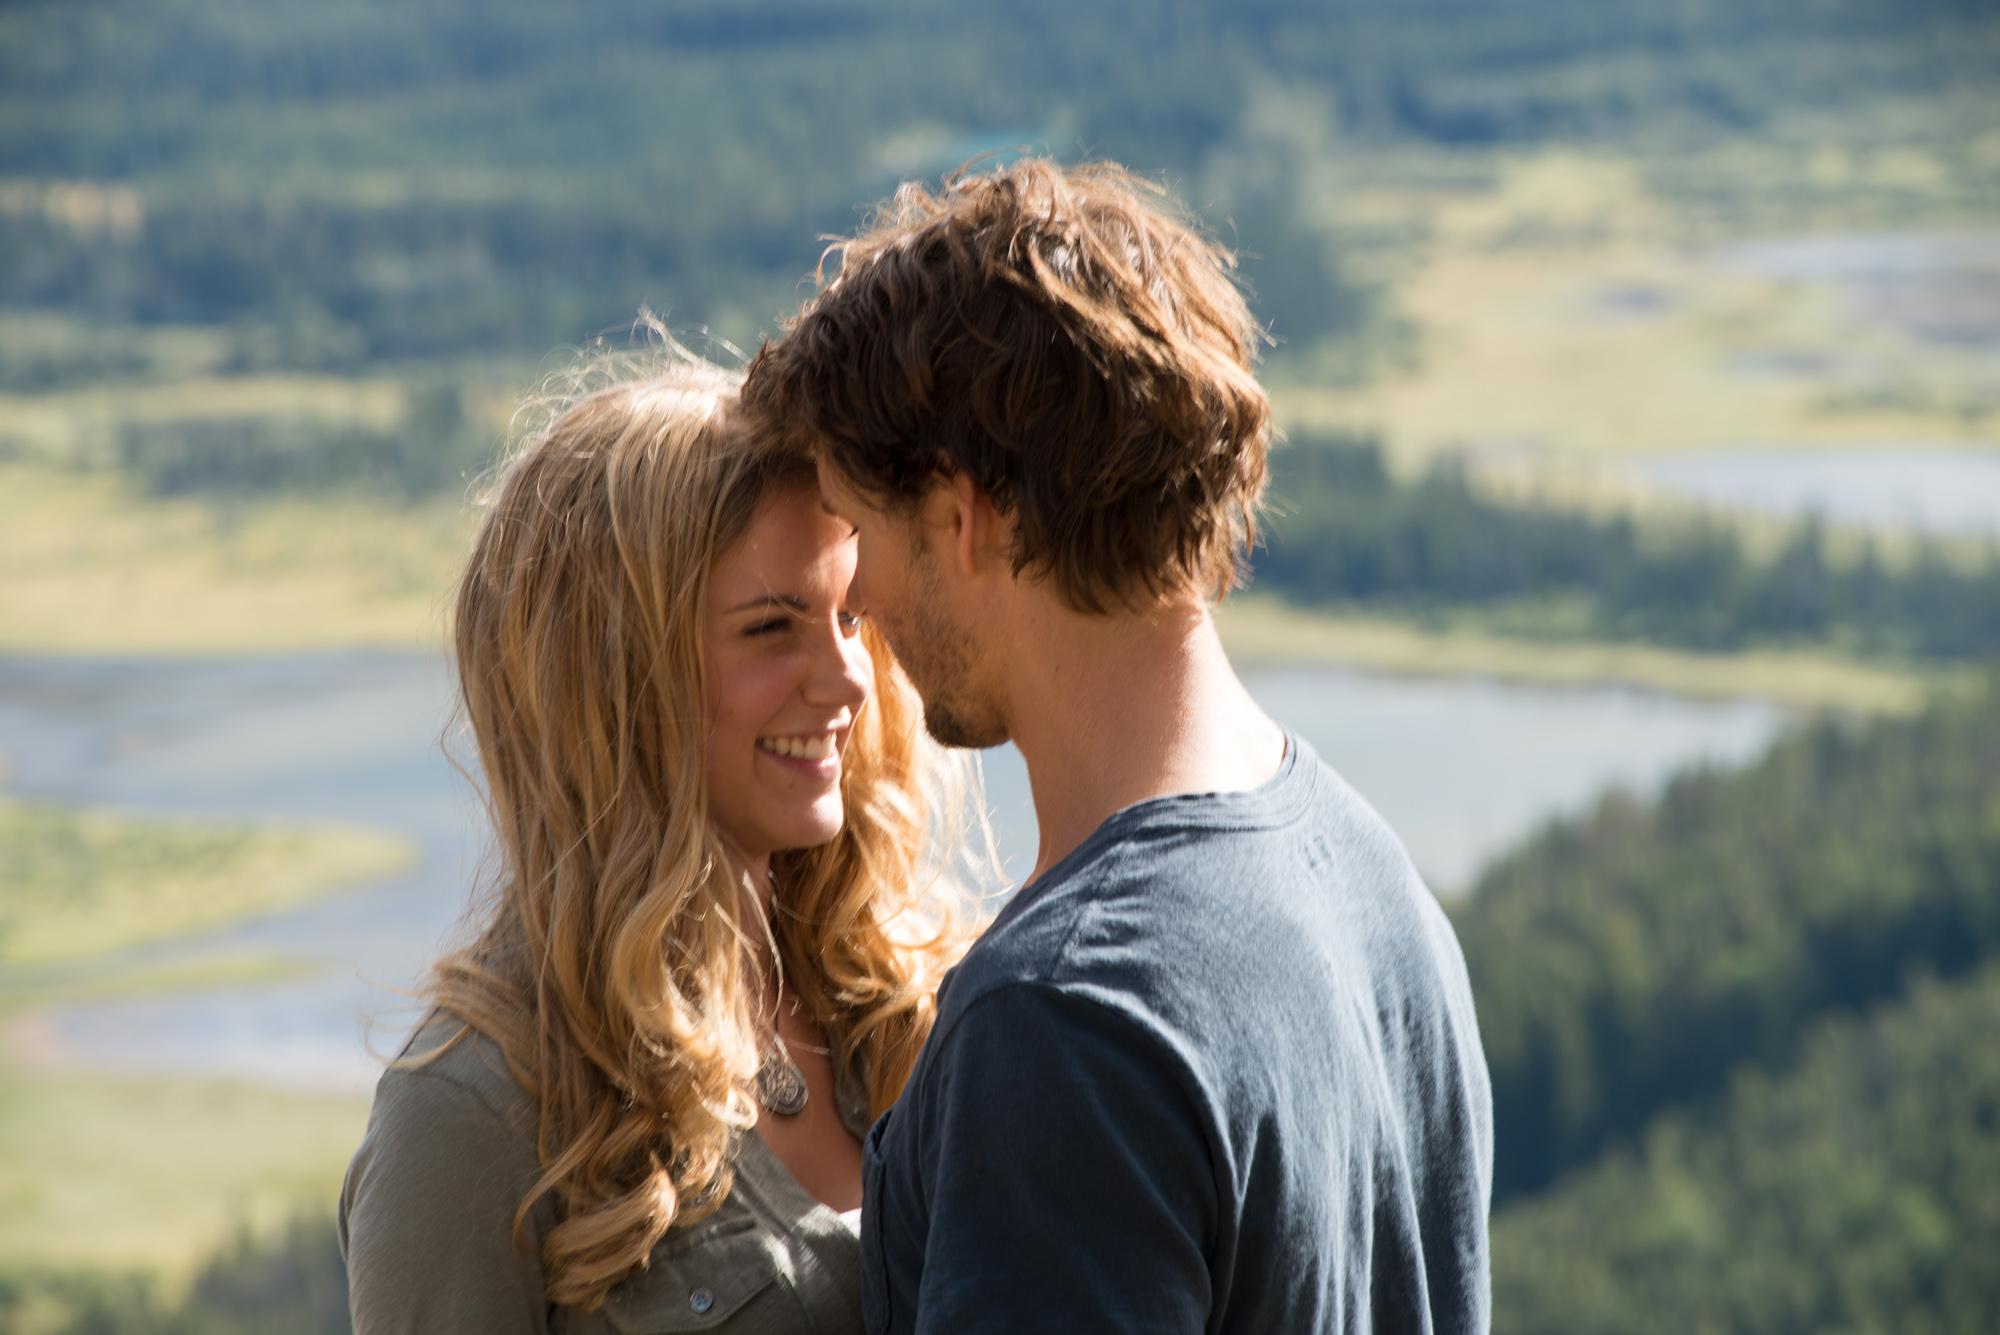 romantik filme 2014